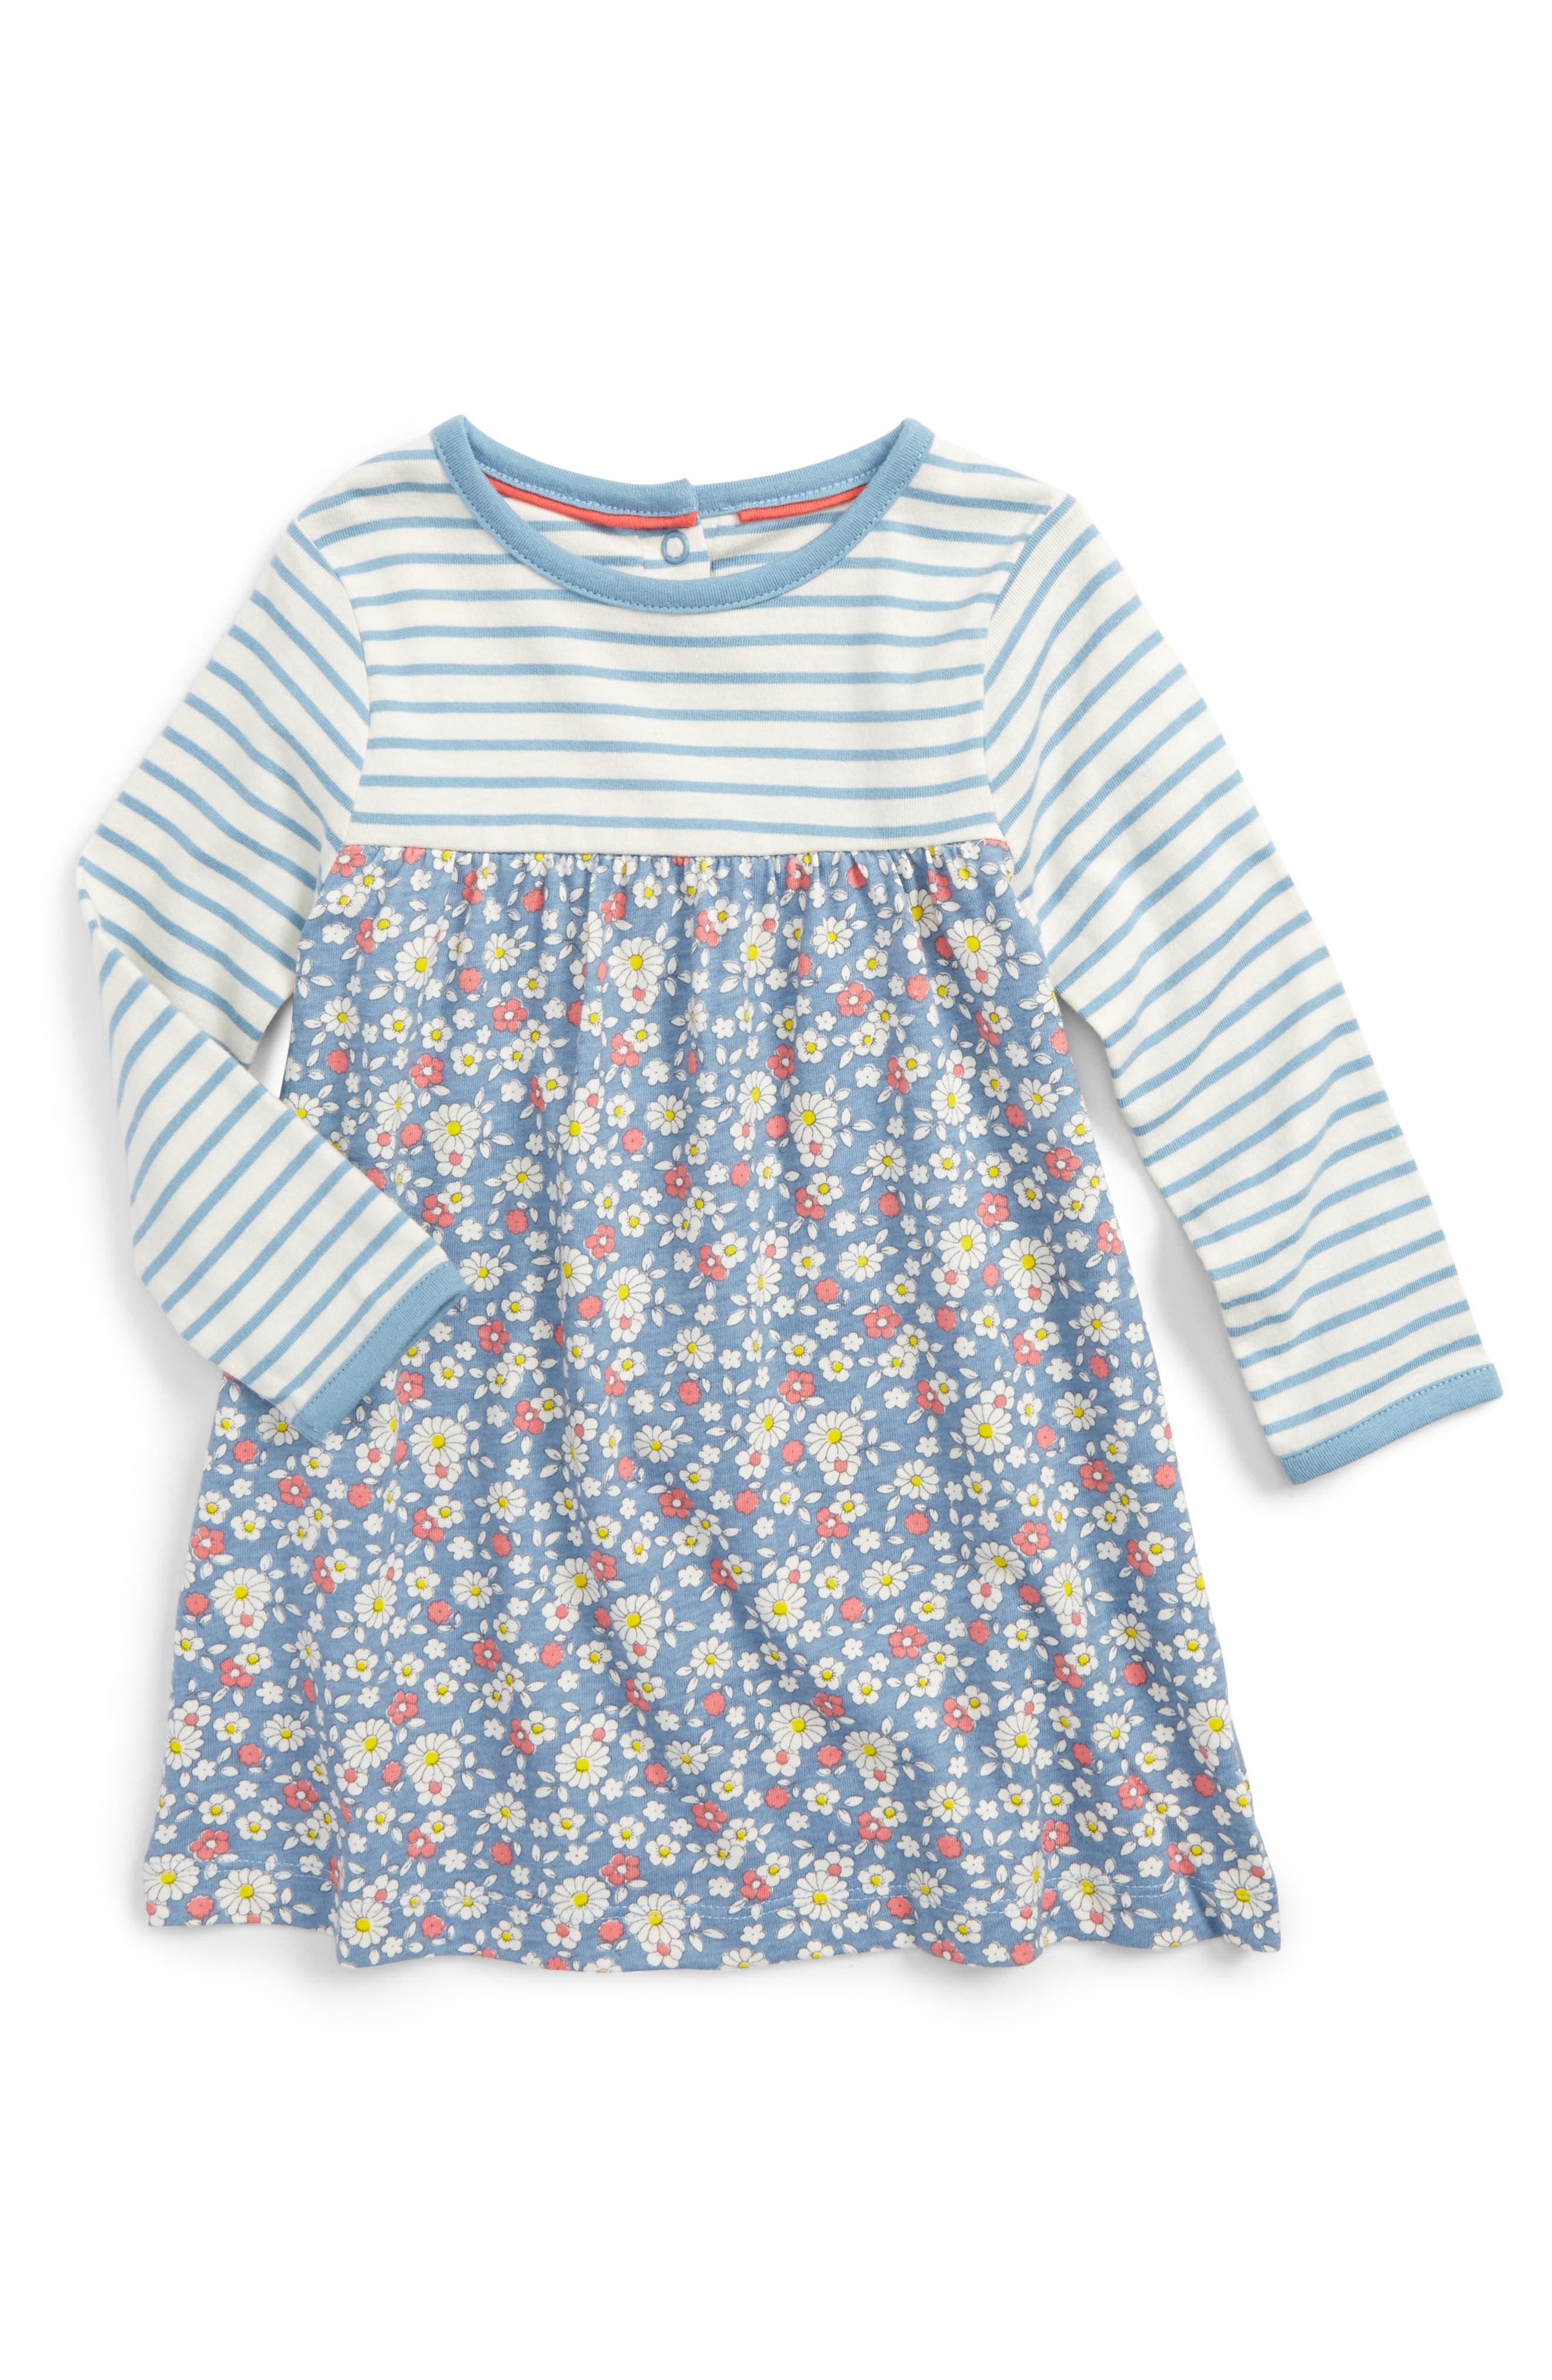 Hotchpotch Dress,                             Main thumbnail 1, color,                             400